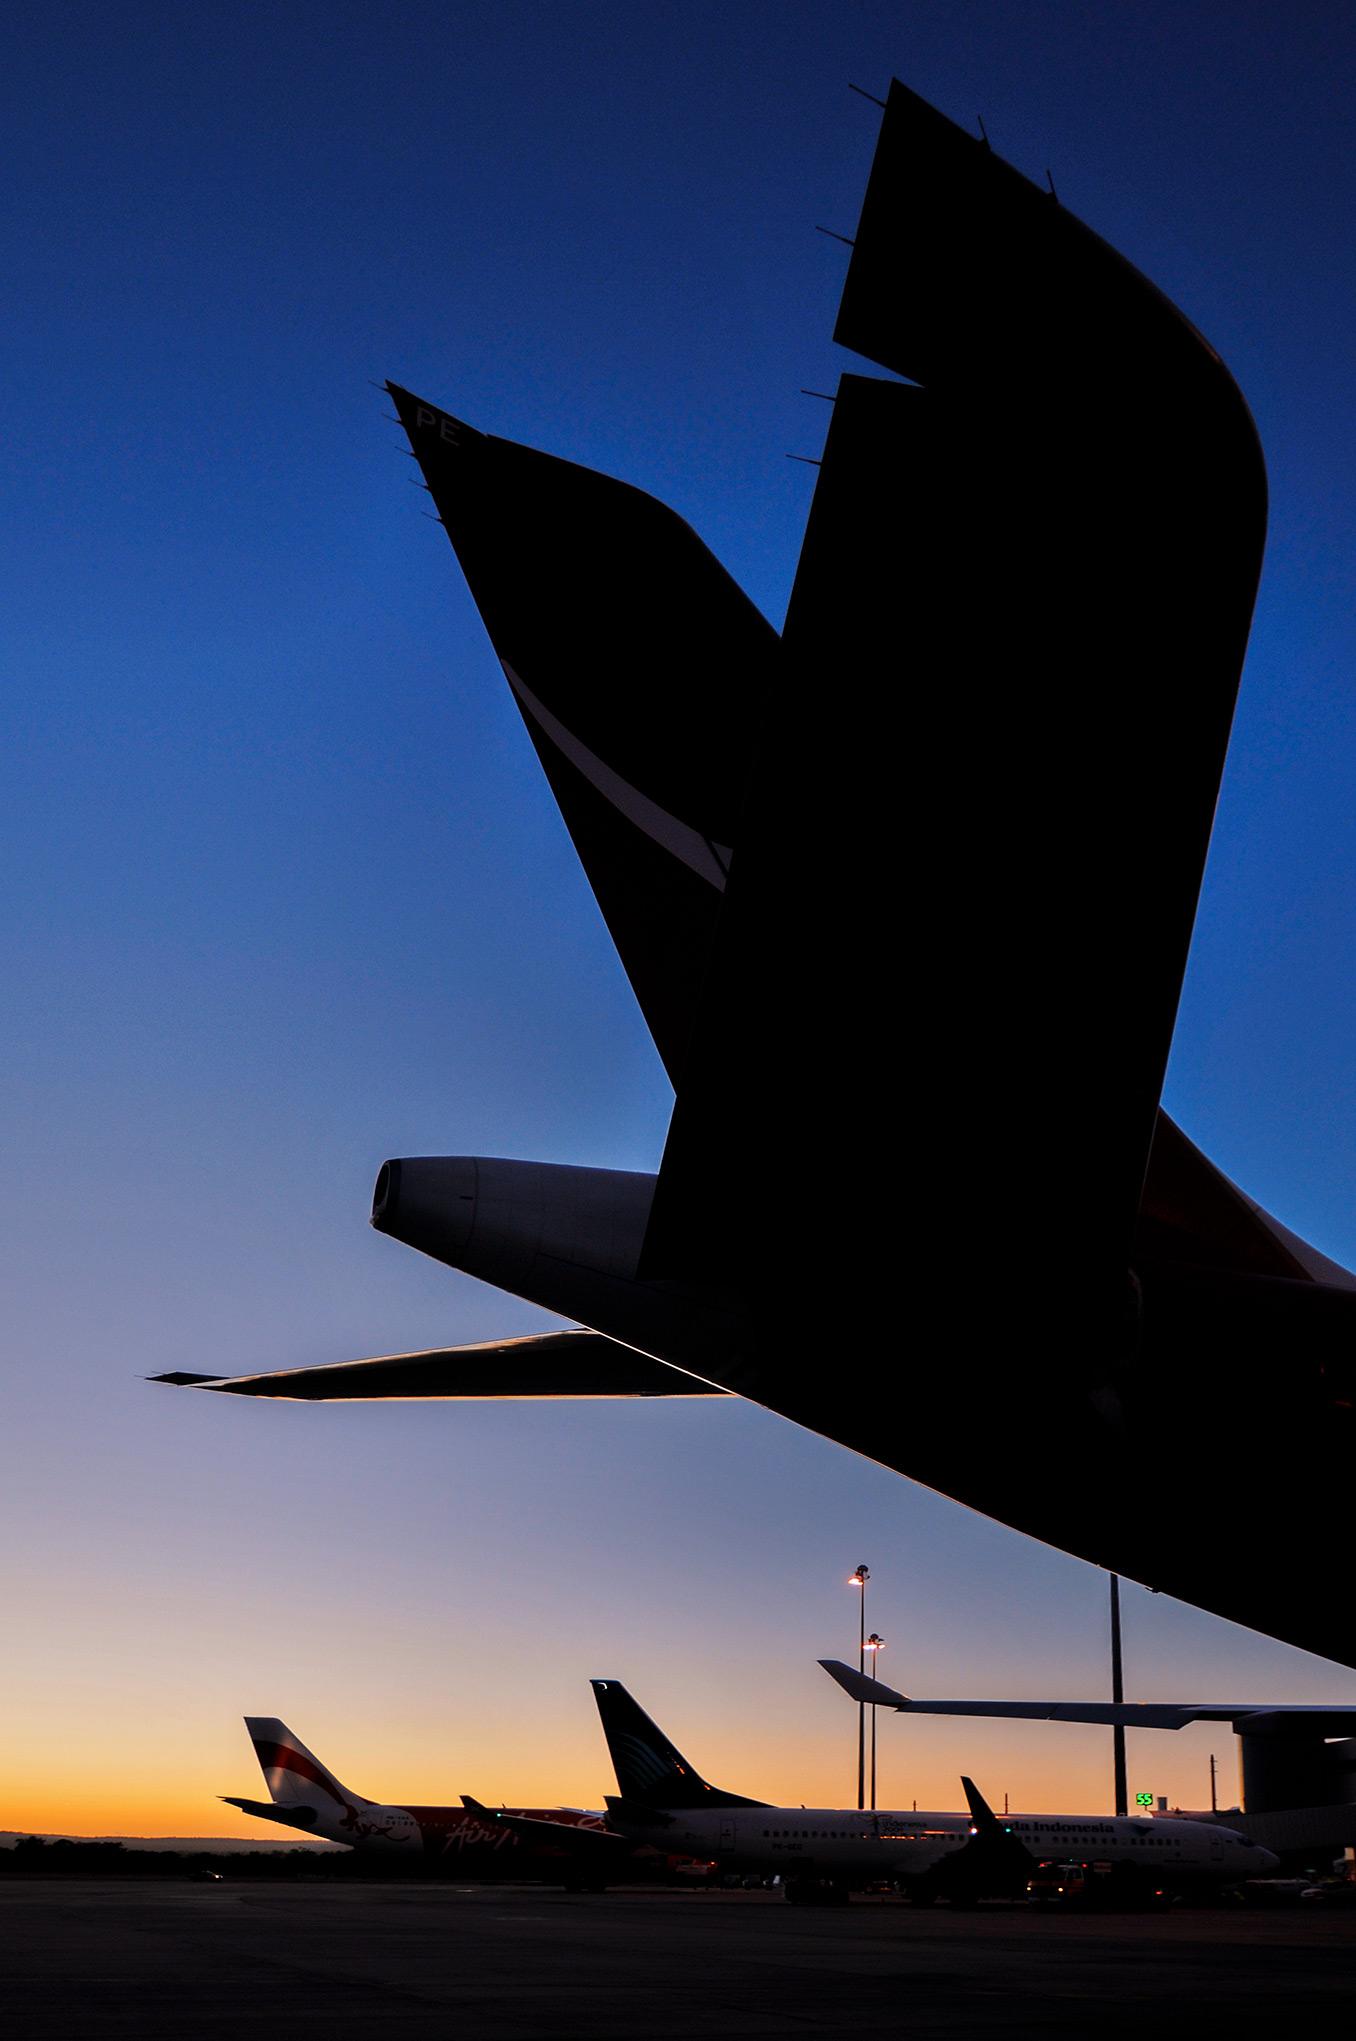 aircraft_tails_dusk_portrait.jpg